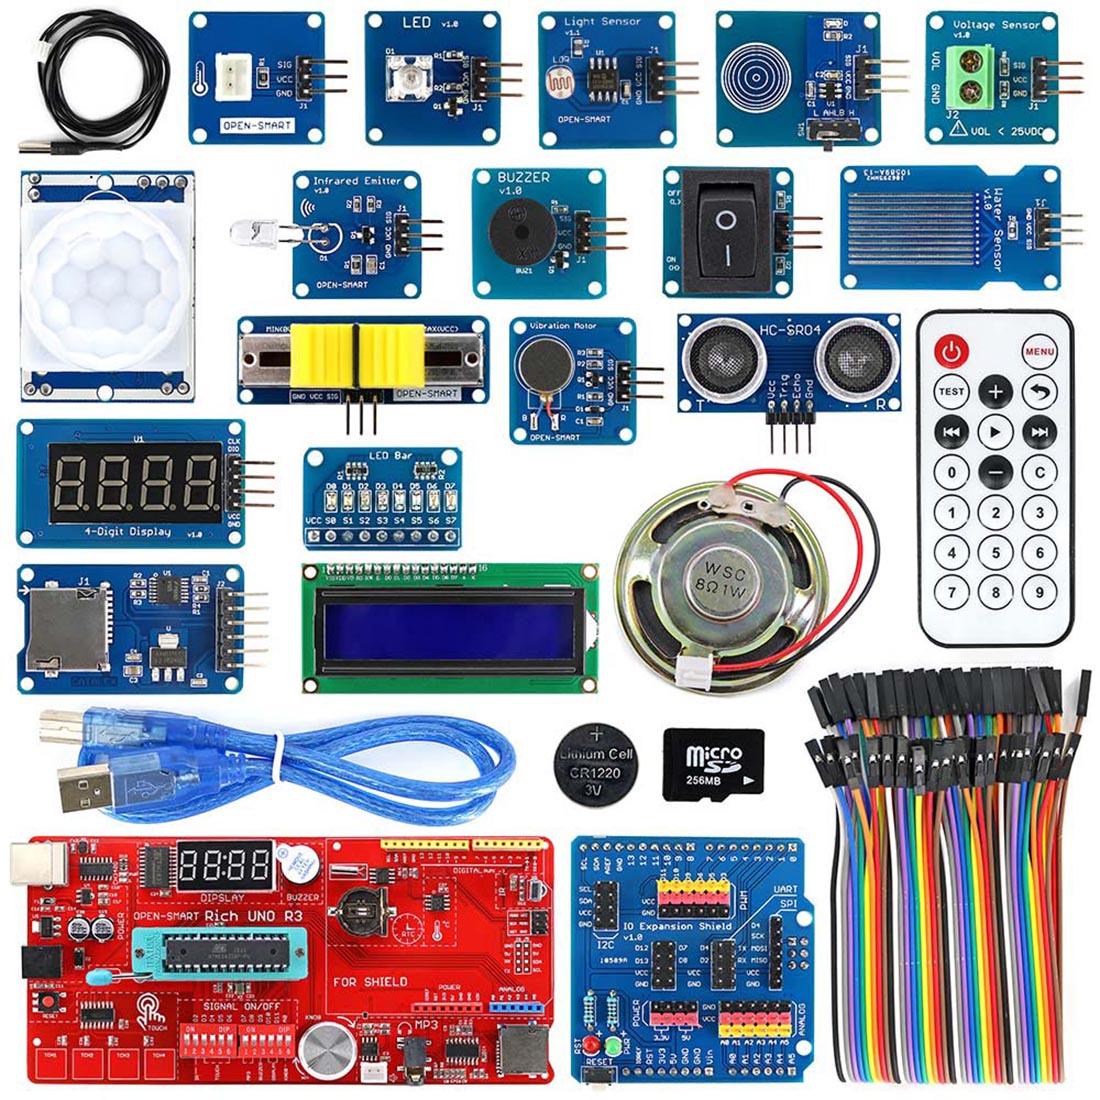 MODIKER Diy High Tech Programmable Toys For UNO R3 For Atmega328P Development Board Module Kit For Arduino